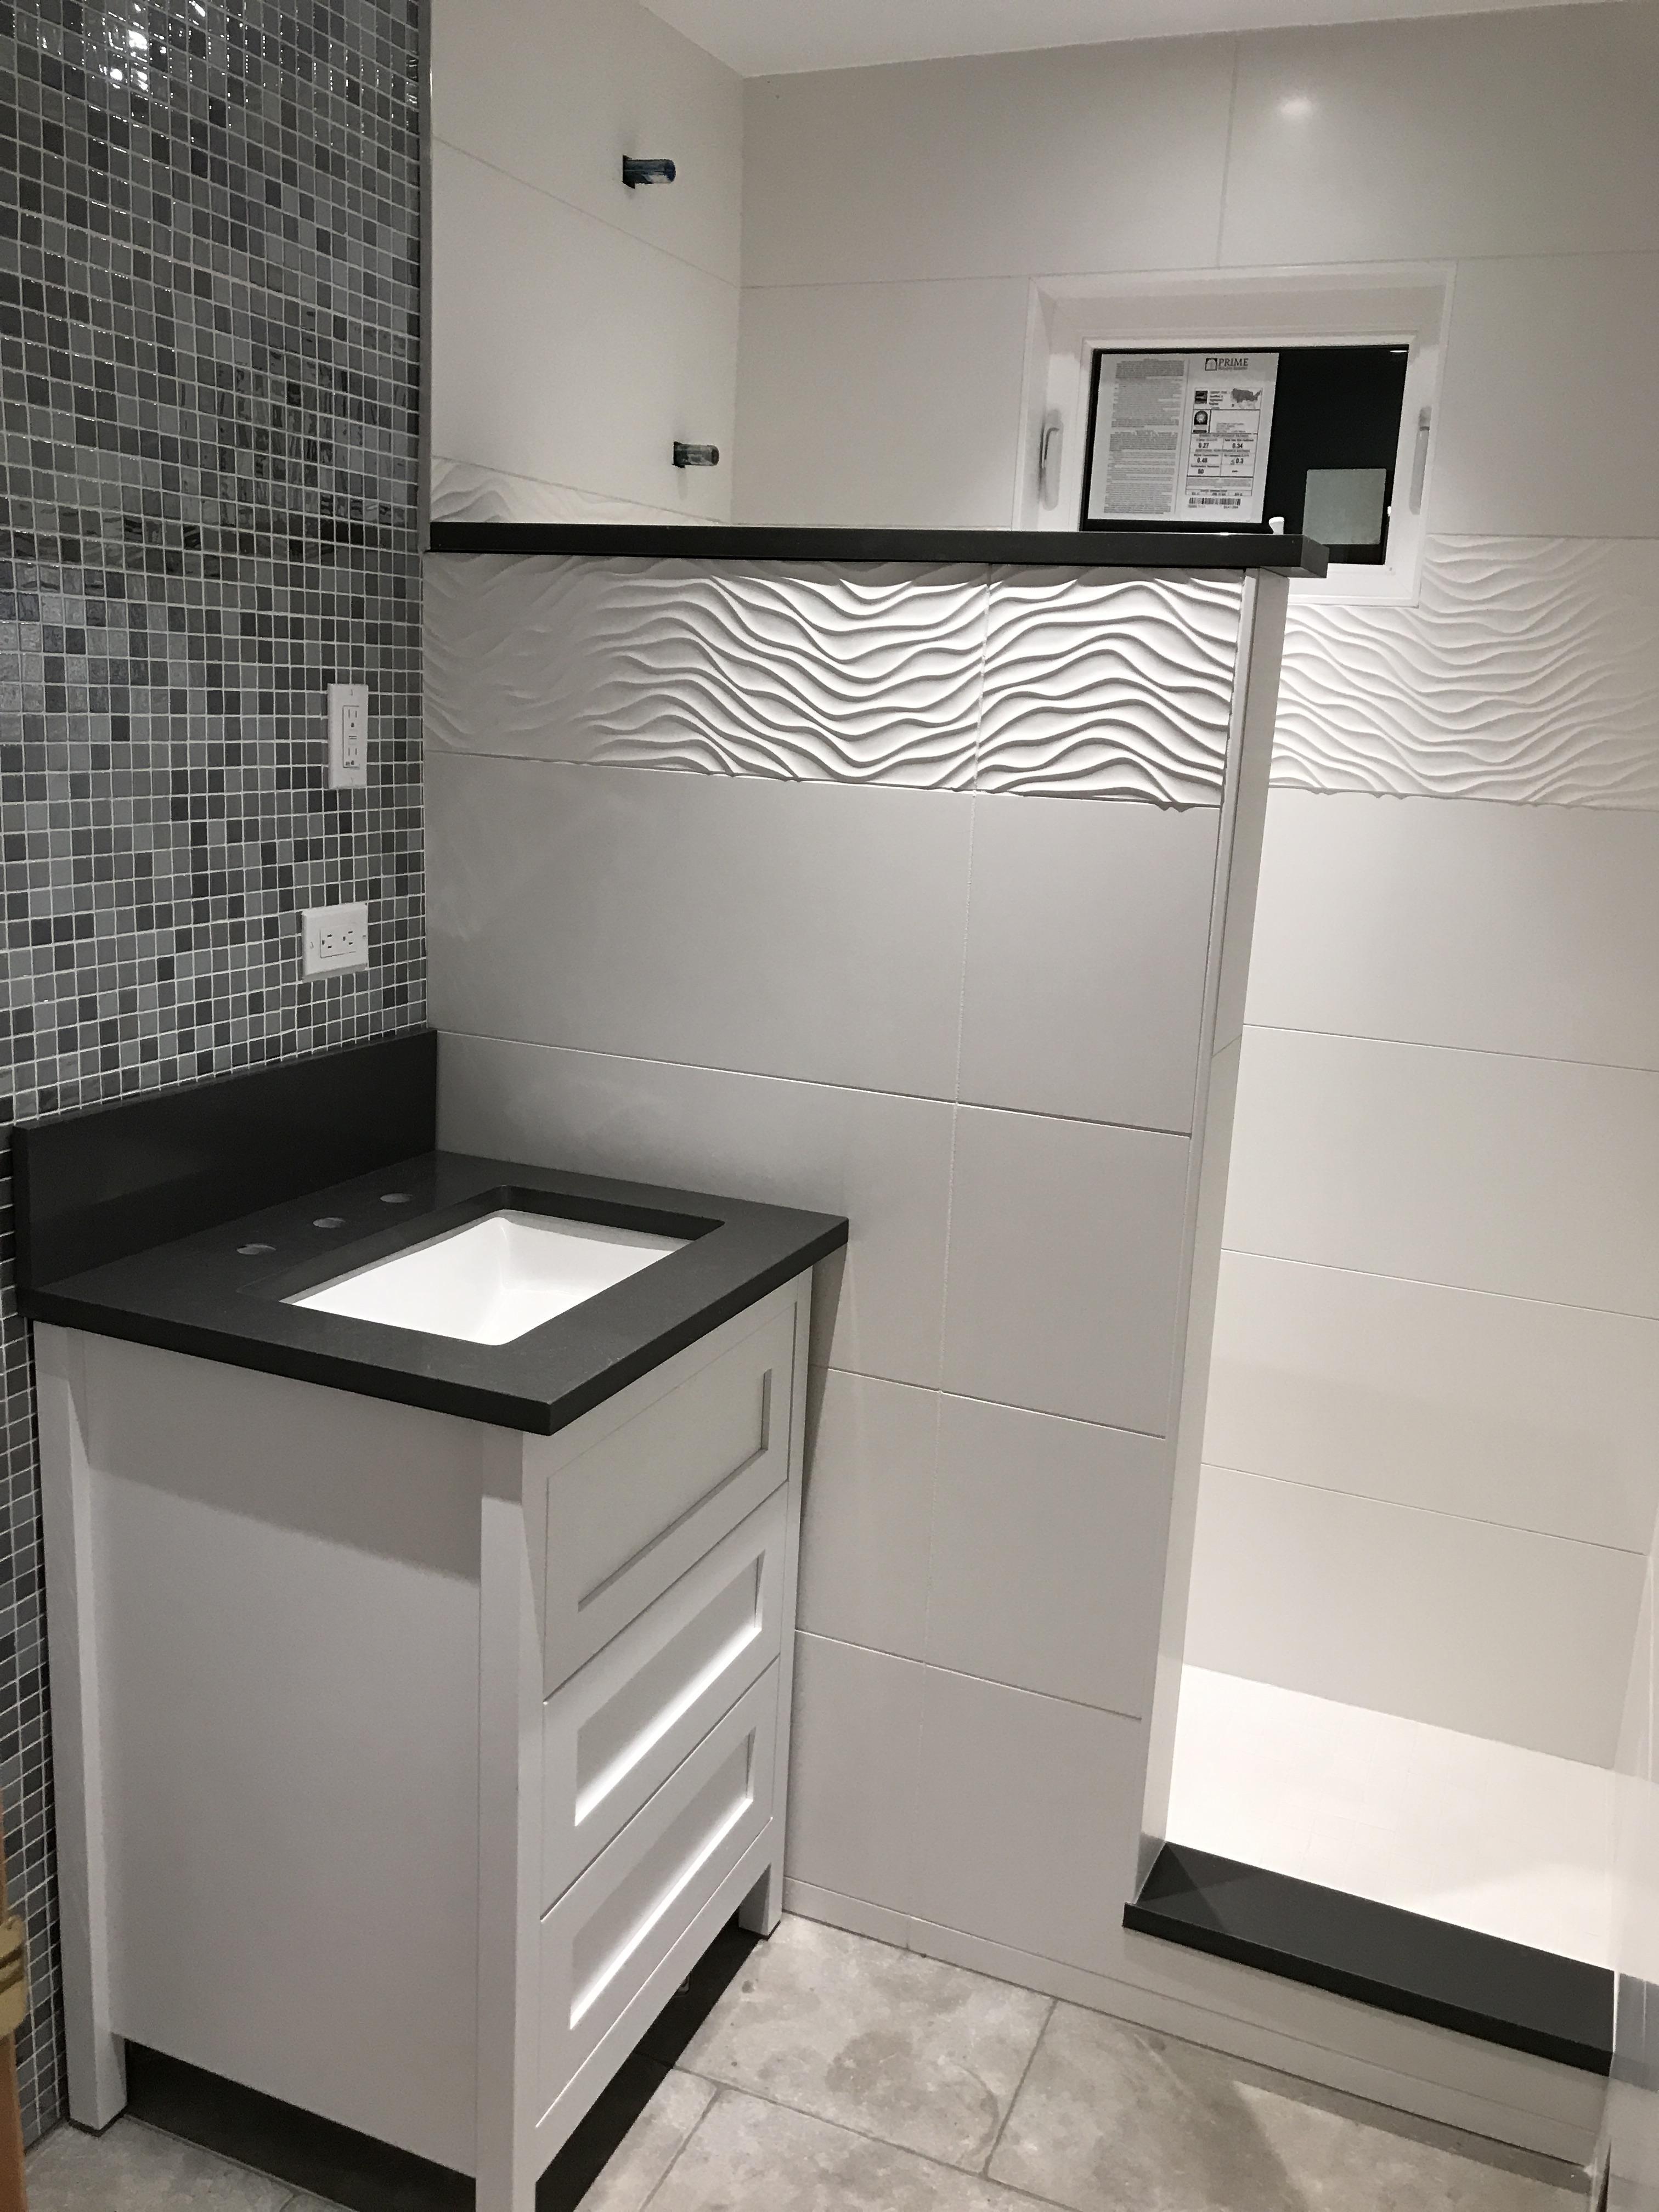 Help me out. Complete bathroom tiled.-563ebb12-8be8-4b38-a648-898e57946203_1528155276580.jpeg